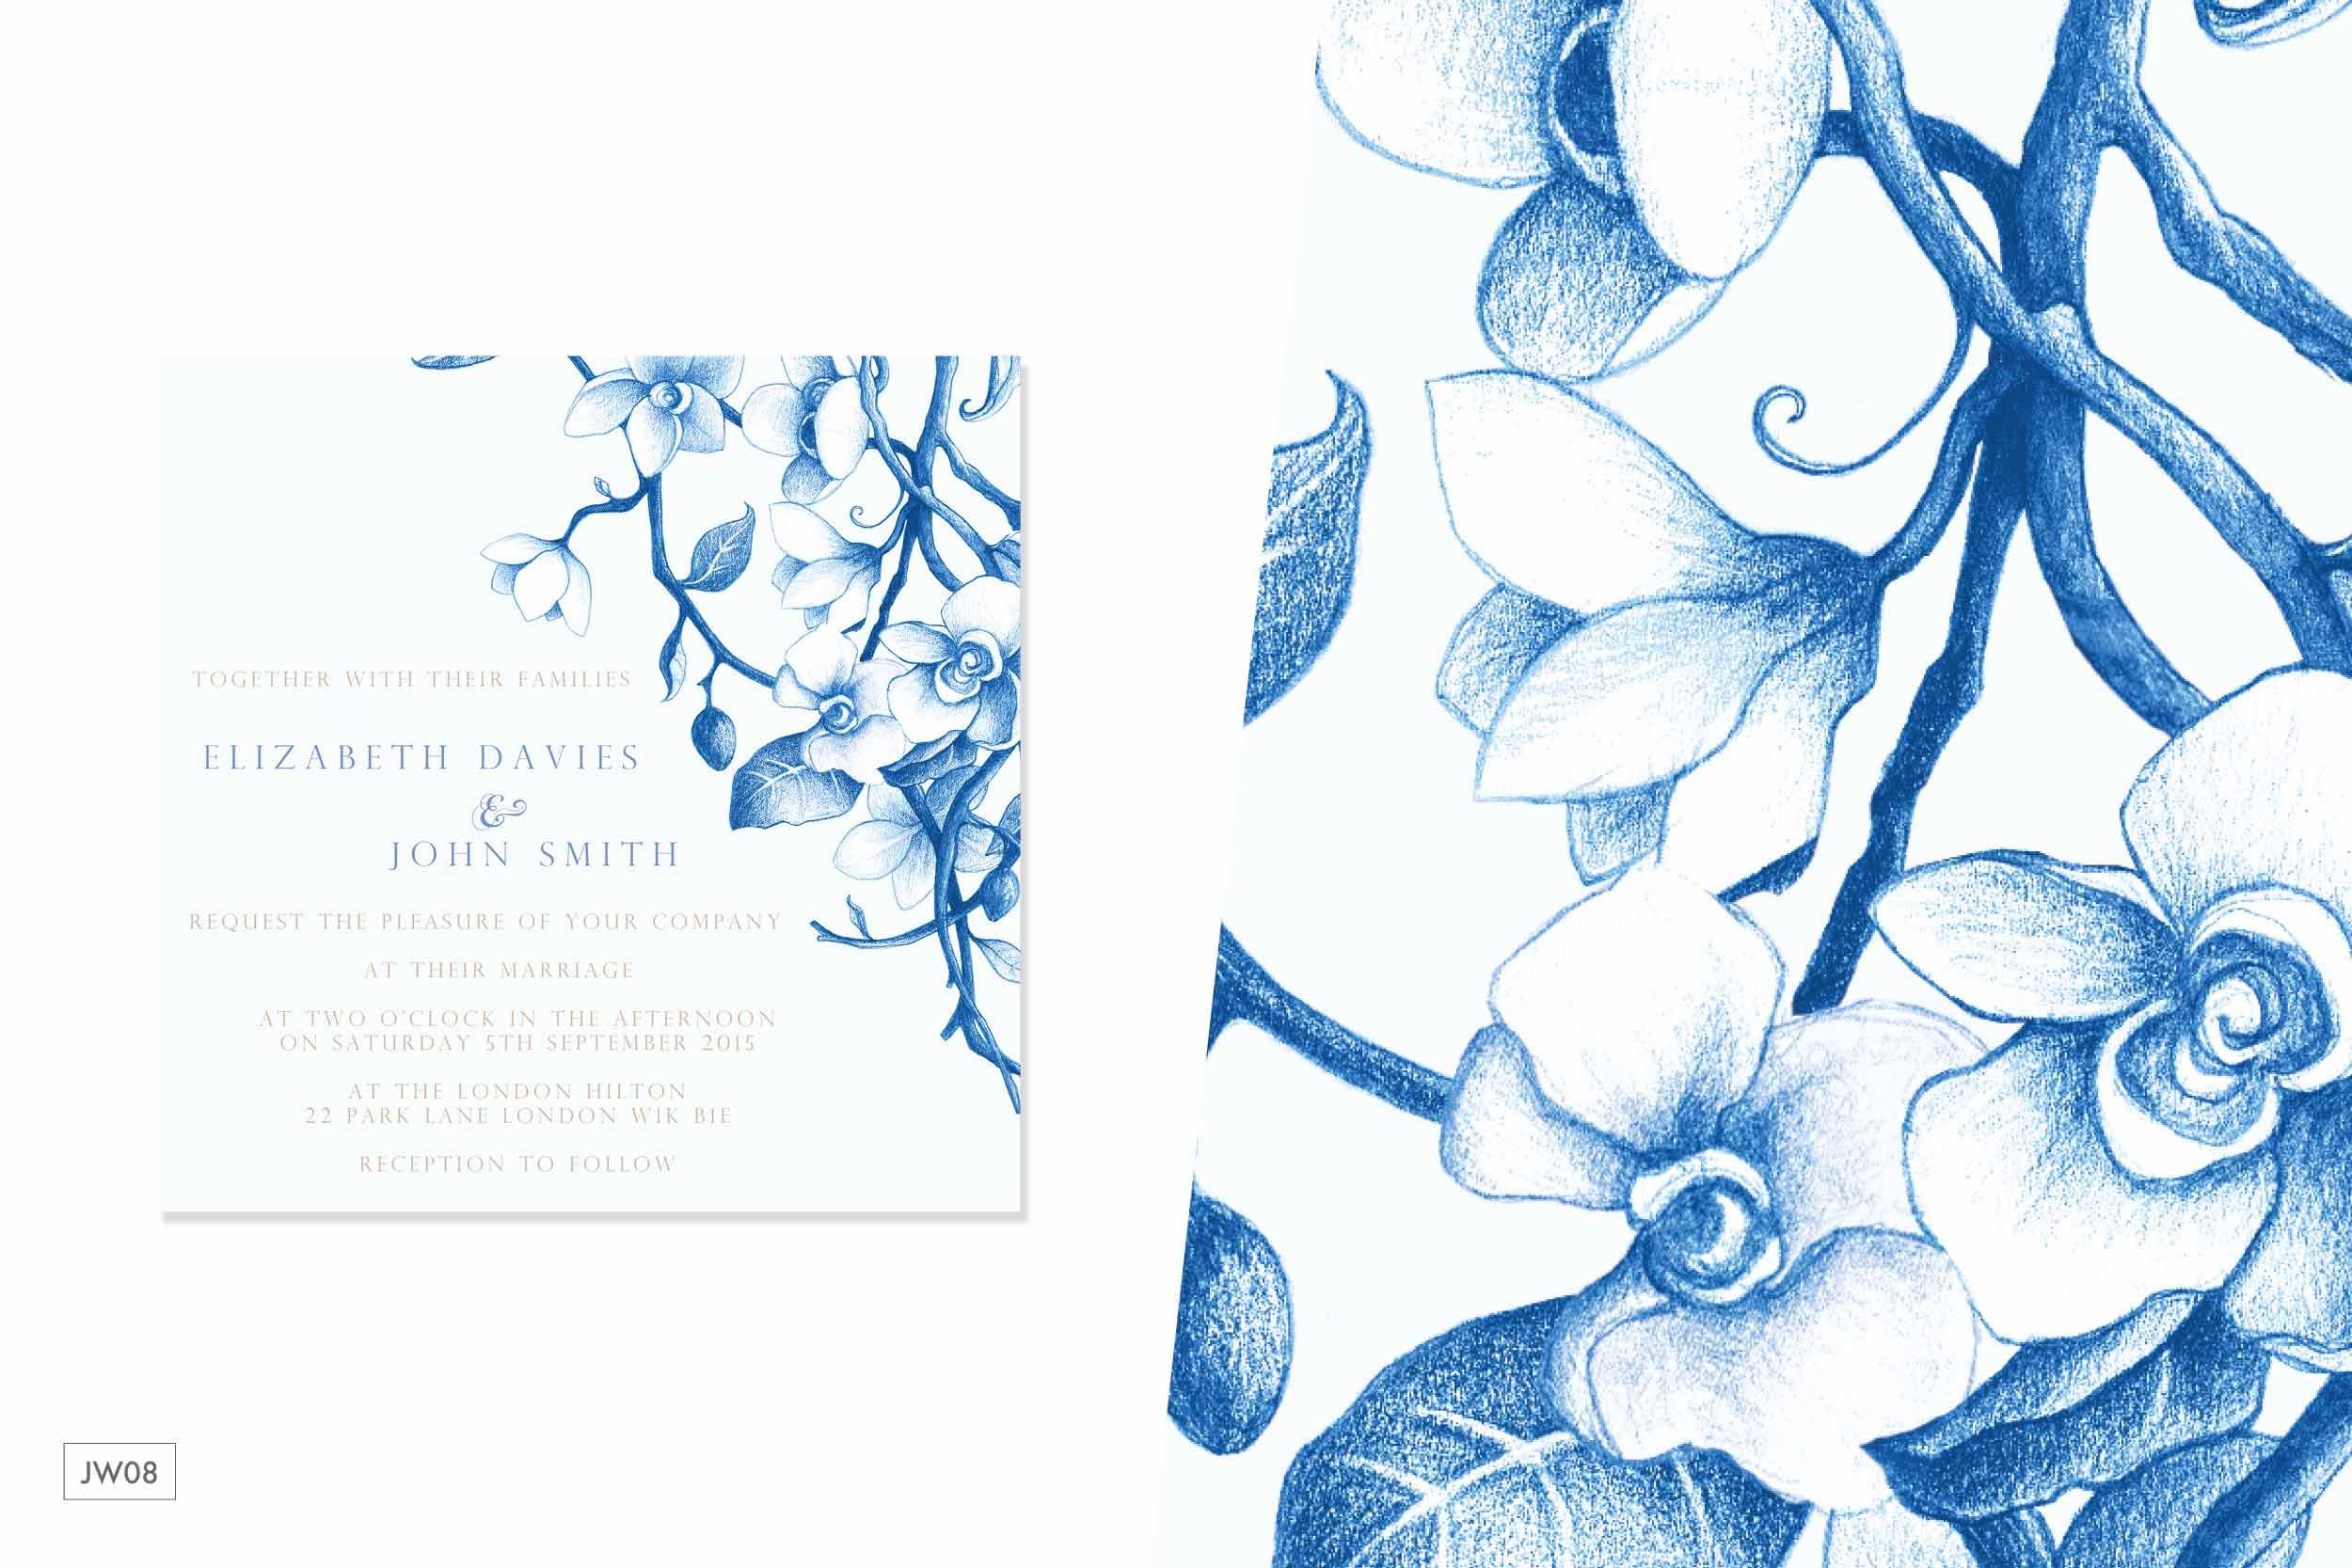 blue_orchid_stationery_jersey-weddings_ananyacards.com-01.jpg